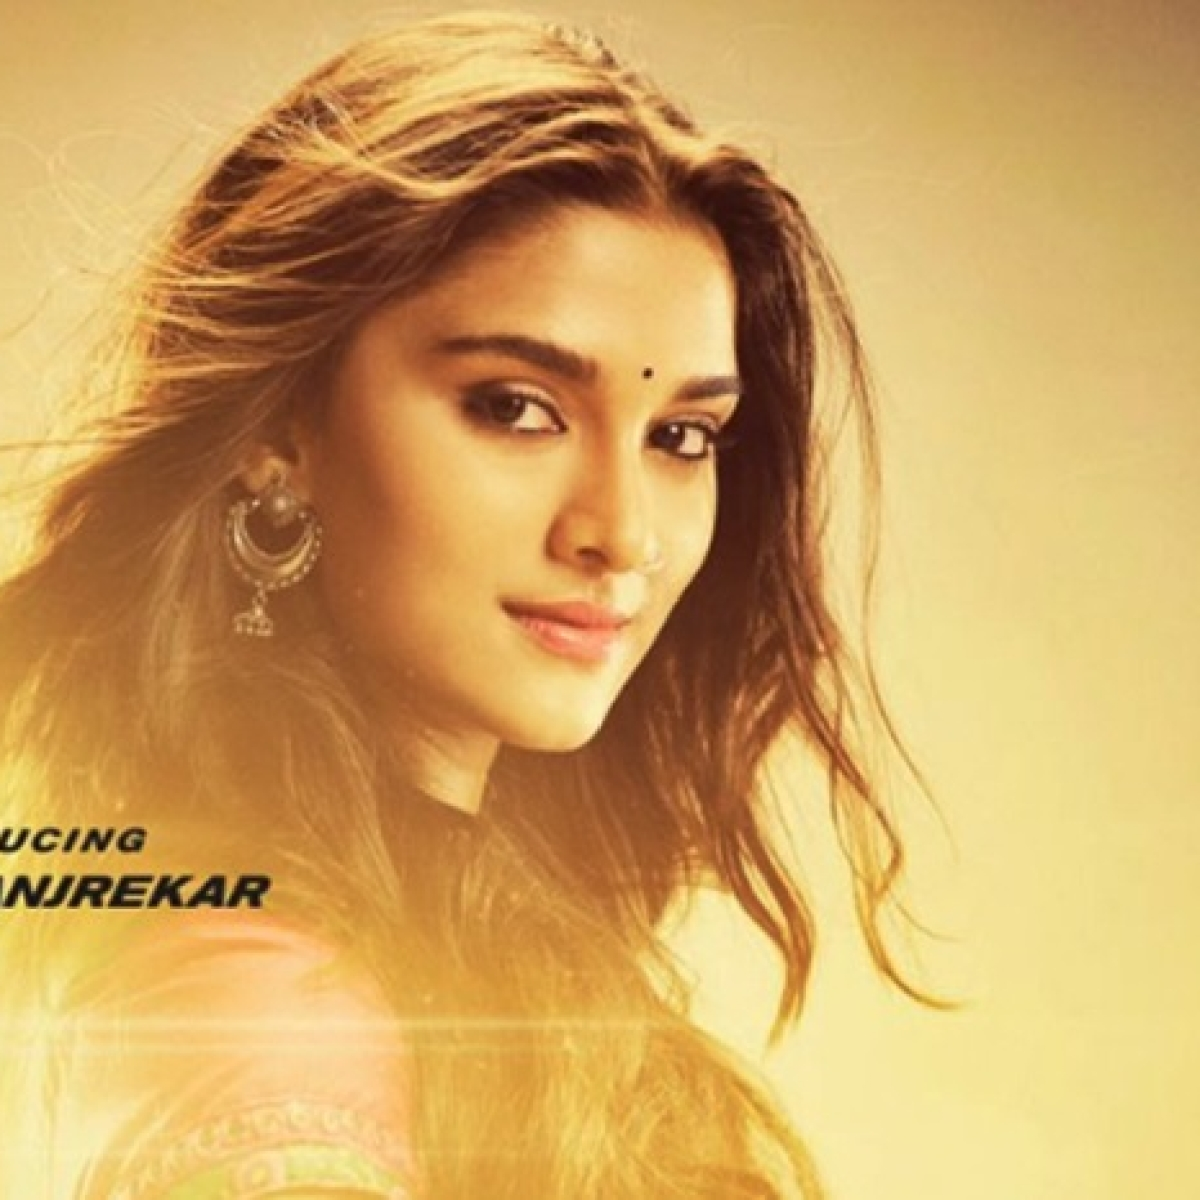 Salman Khan introduces Saiee Manjrekar in new 'Dabangg 3' promo